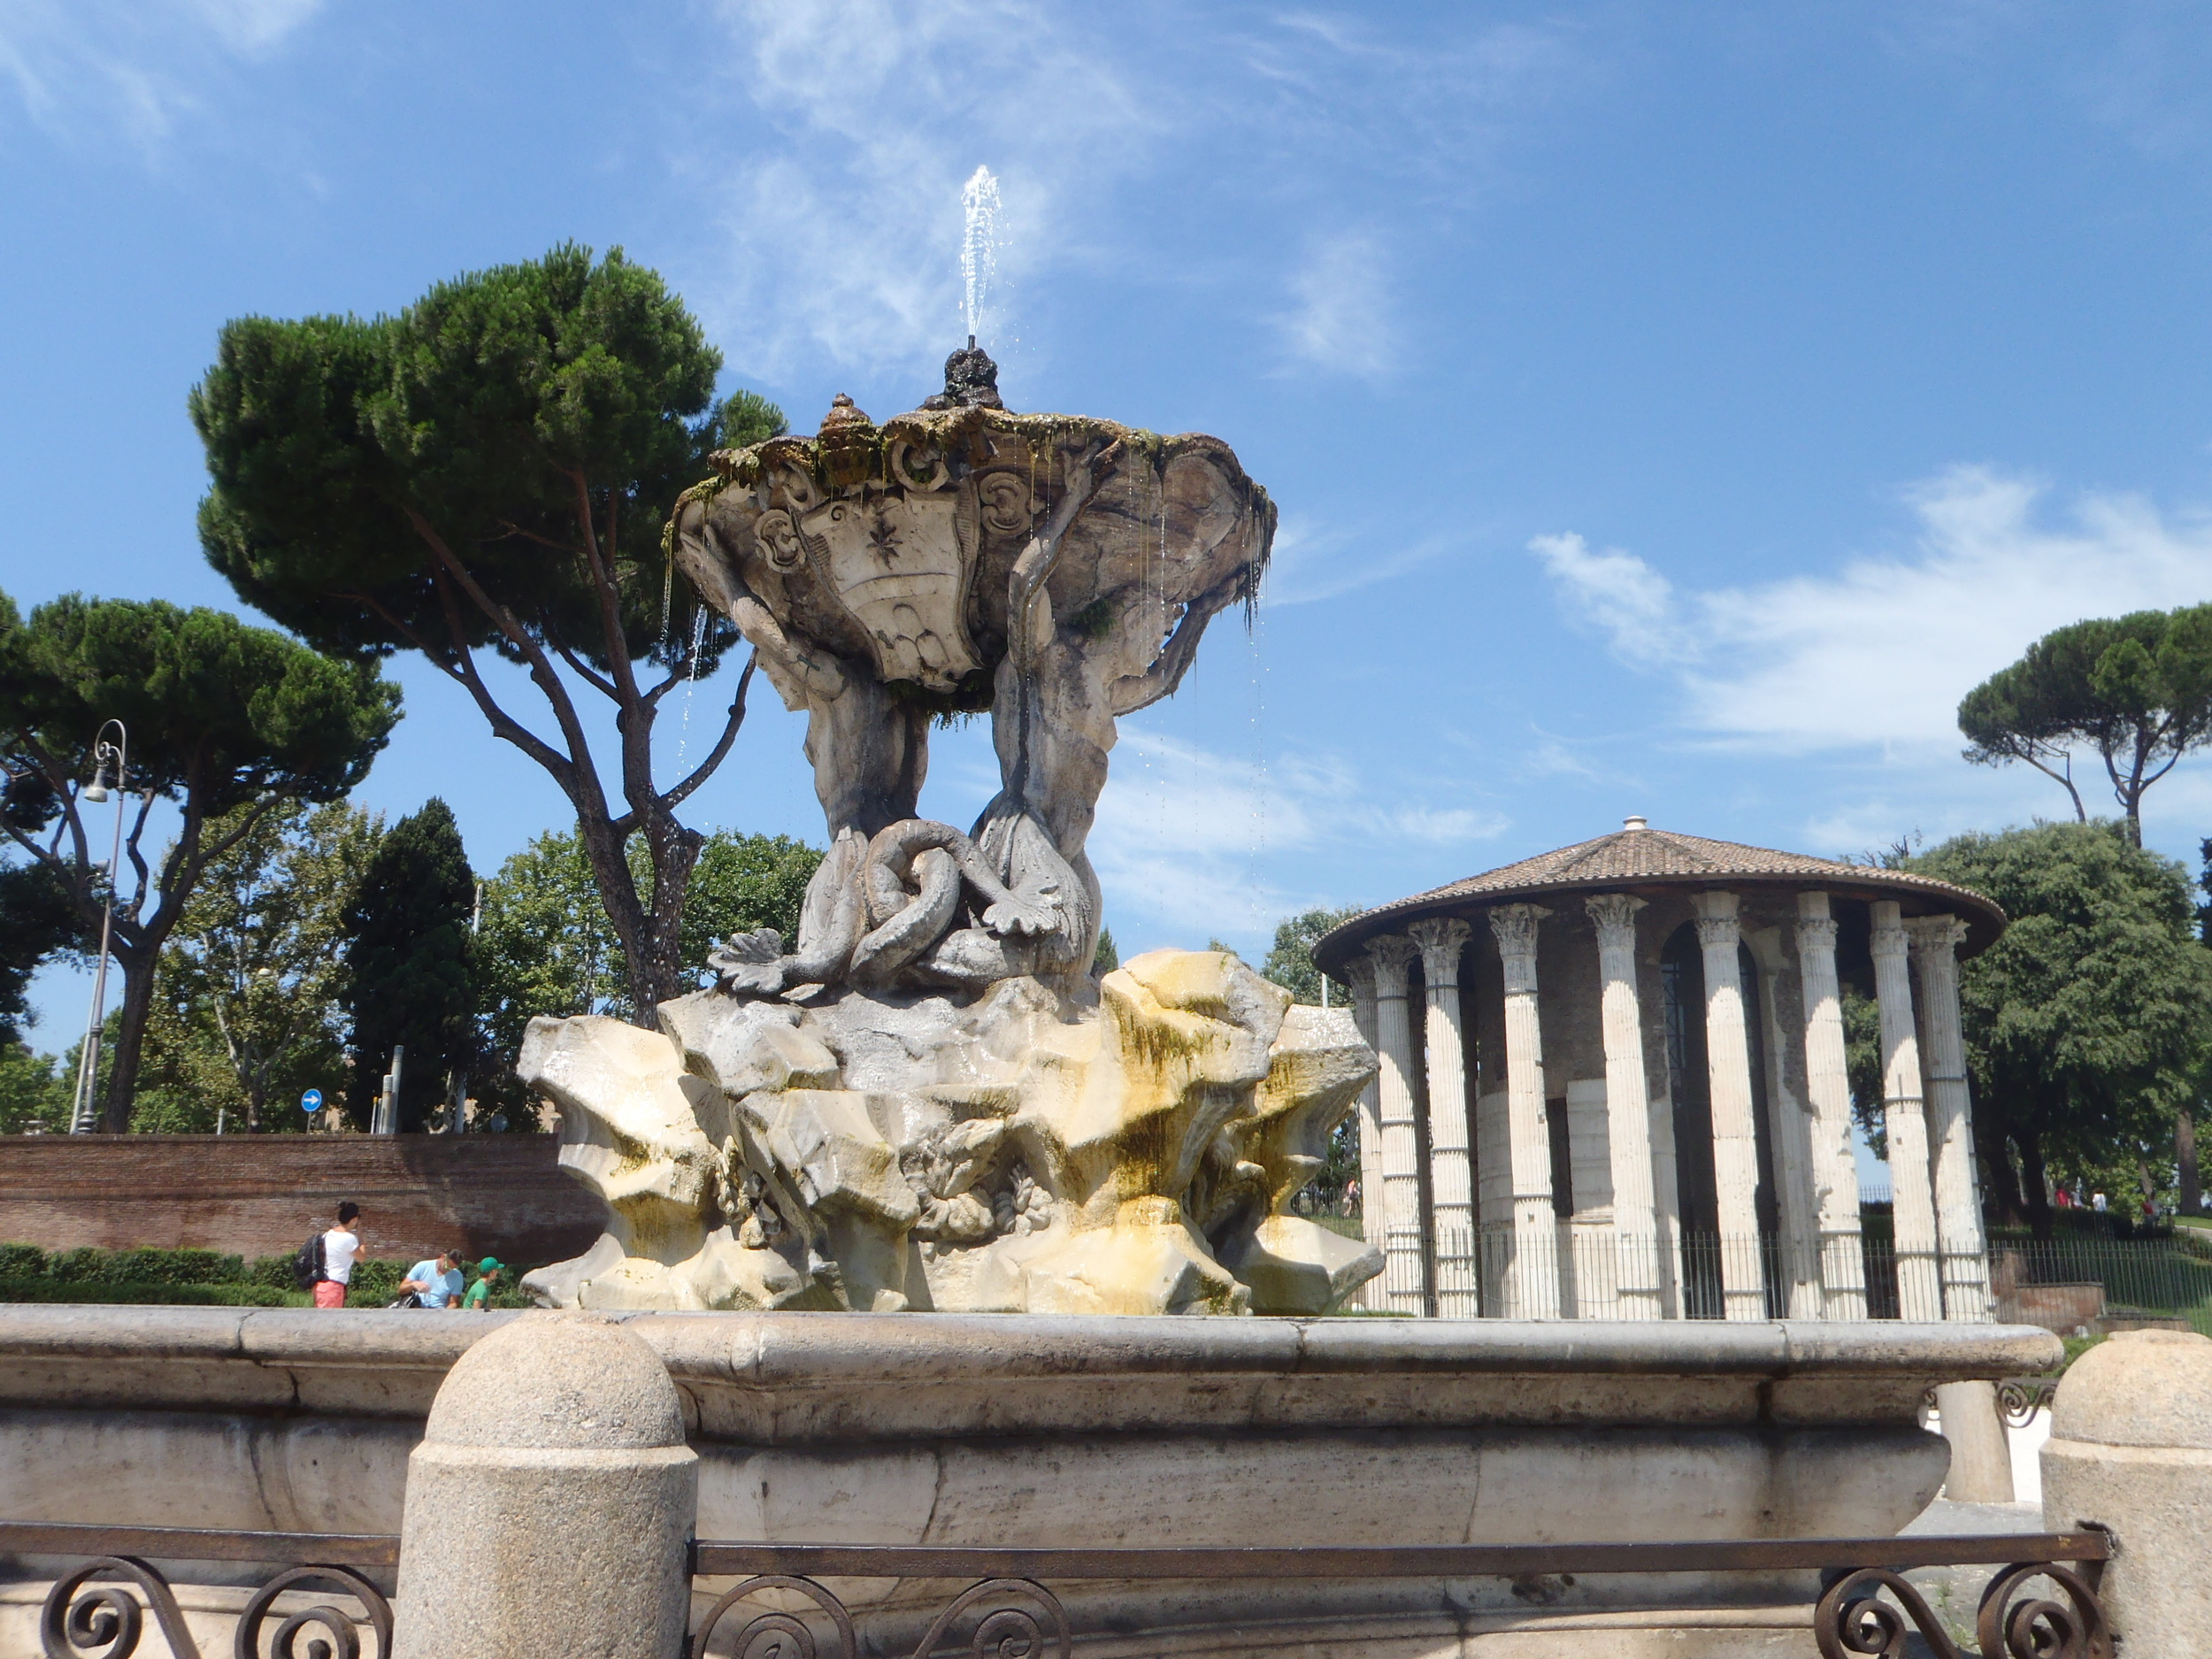 CRO Italy web 2013 - 080.JPG